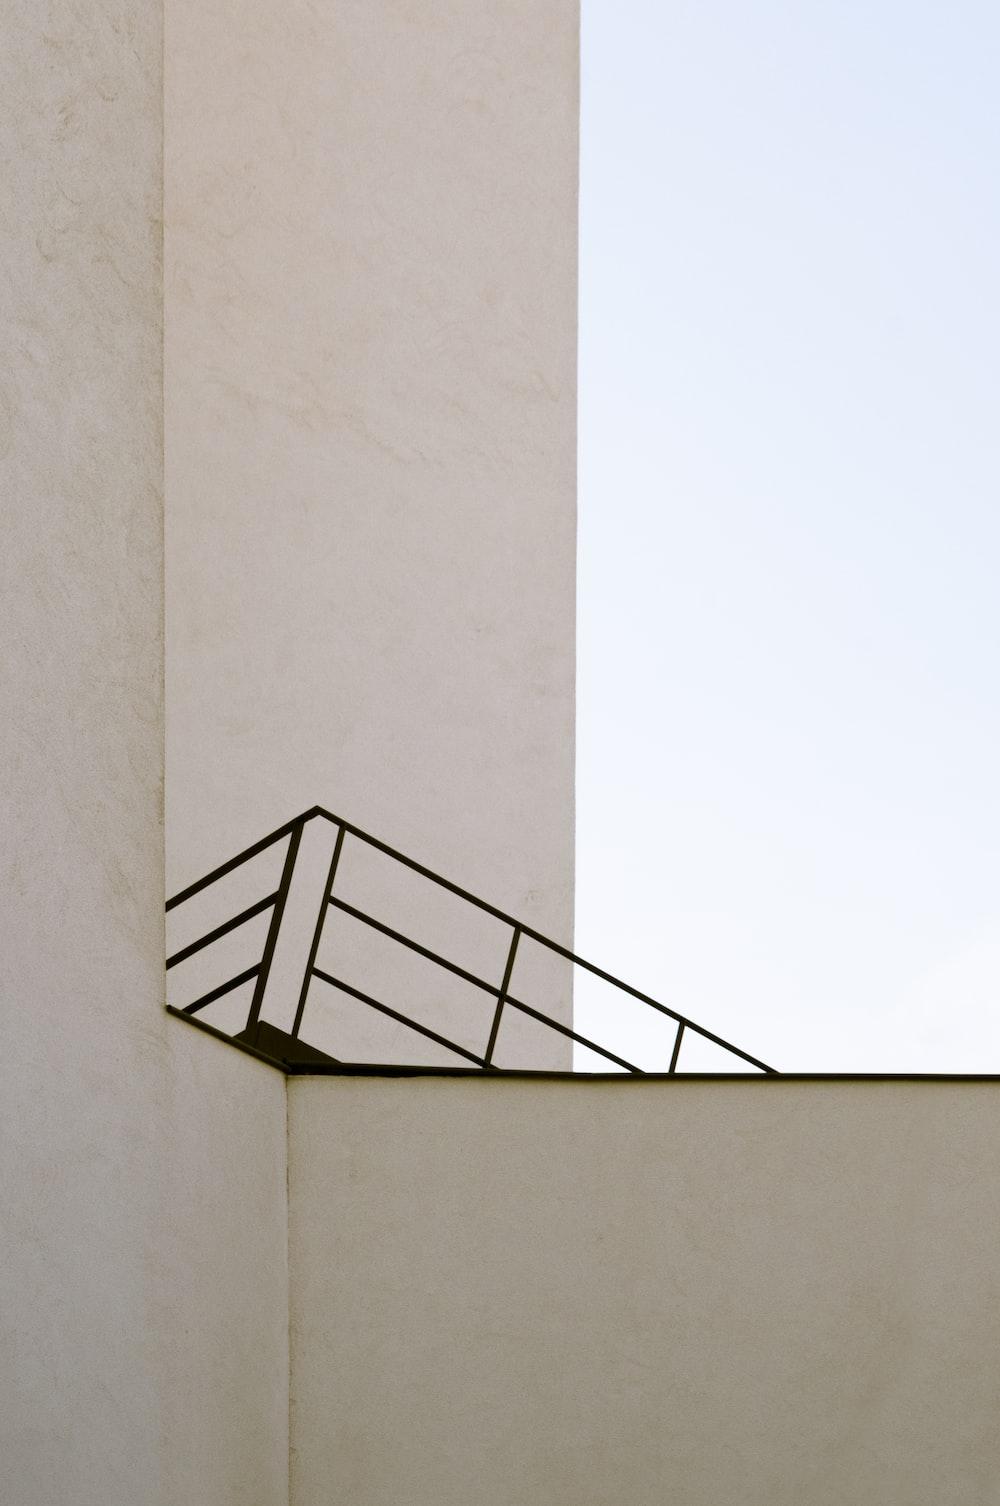 black metal staircase on white wall